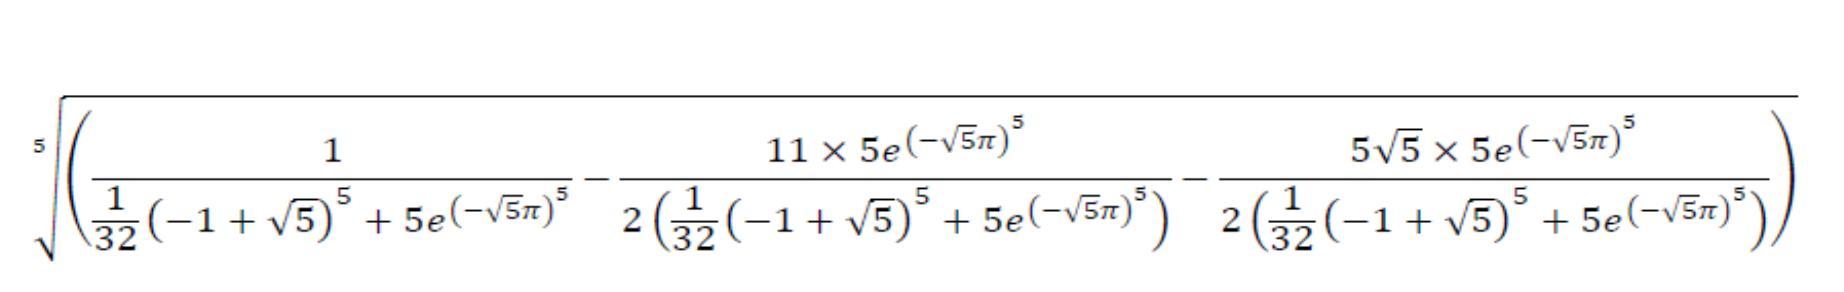 matematica di Ramanujan